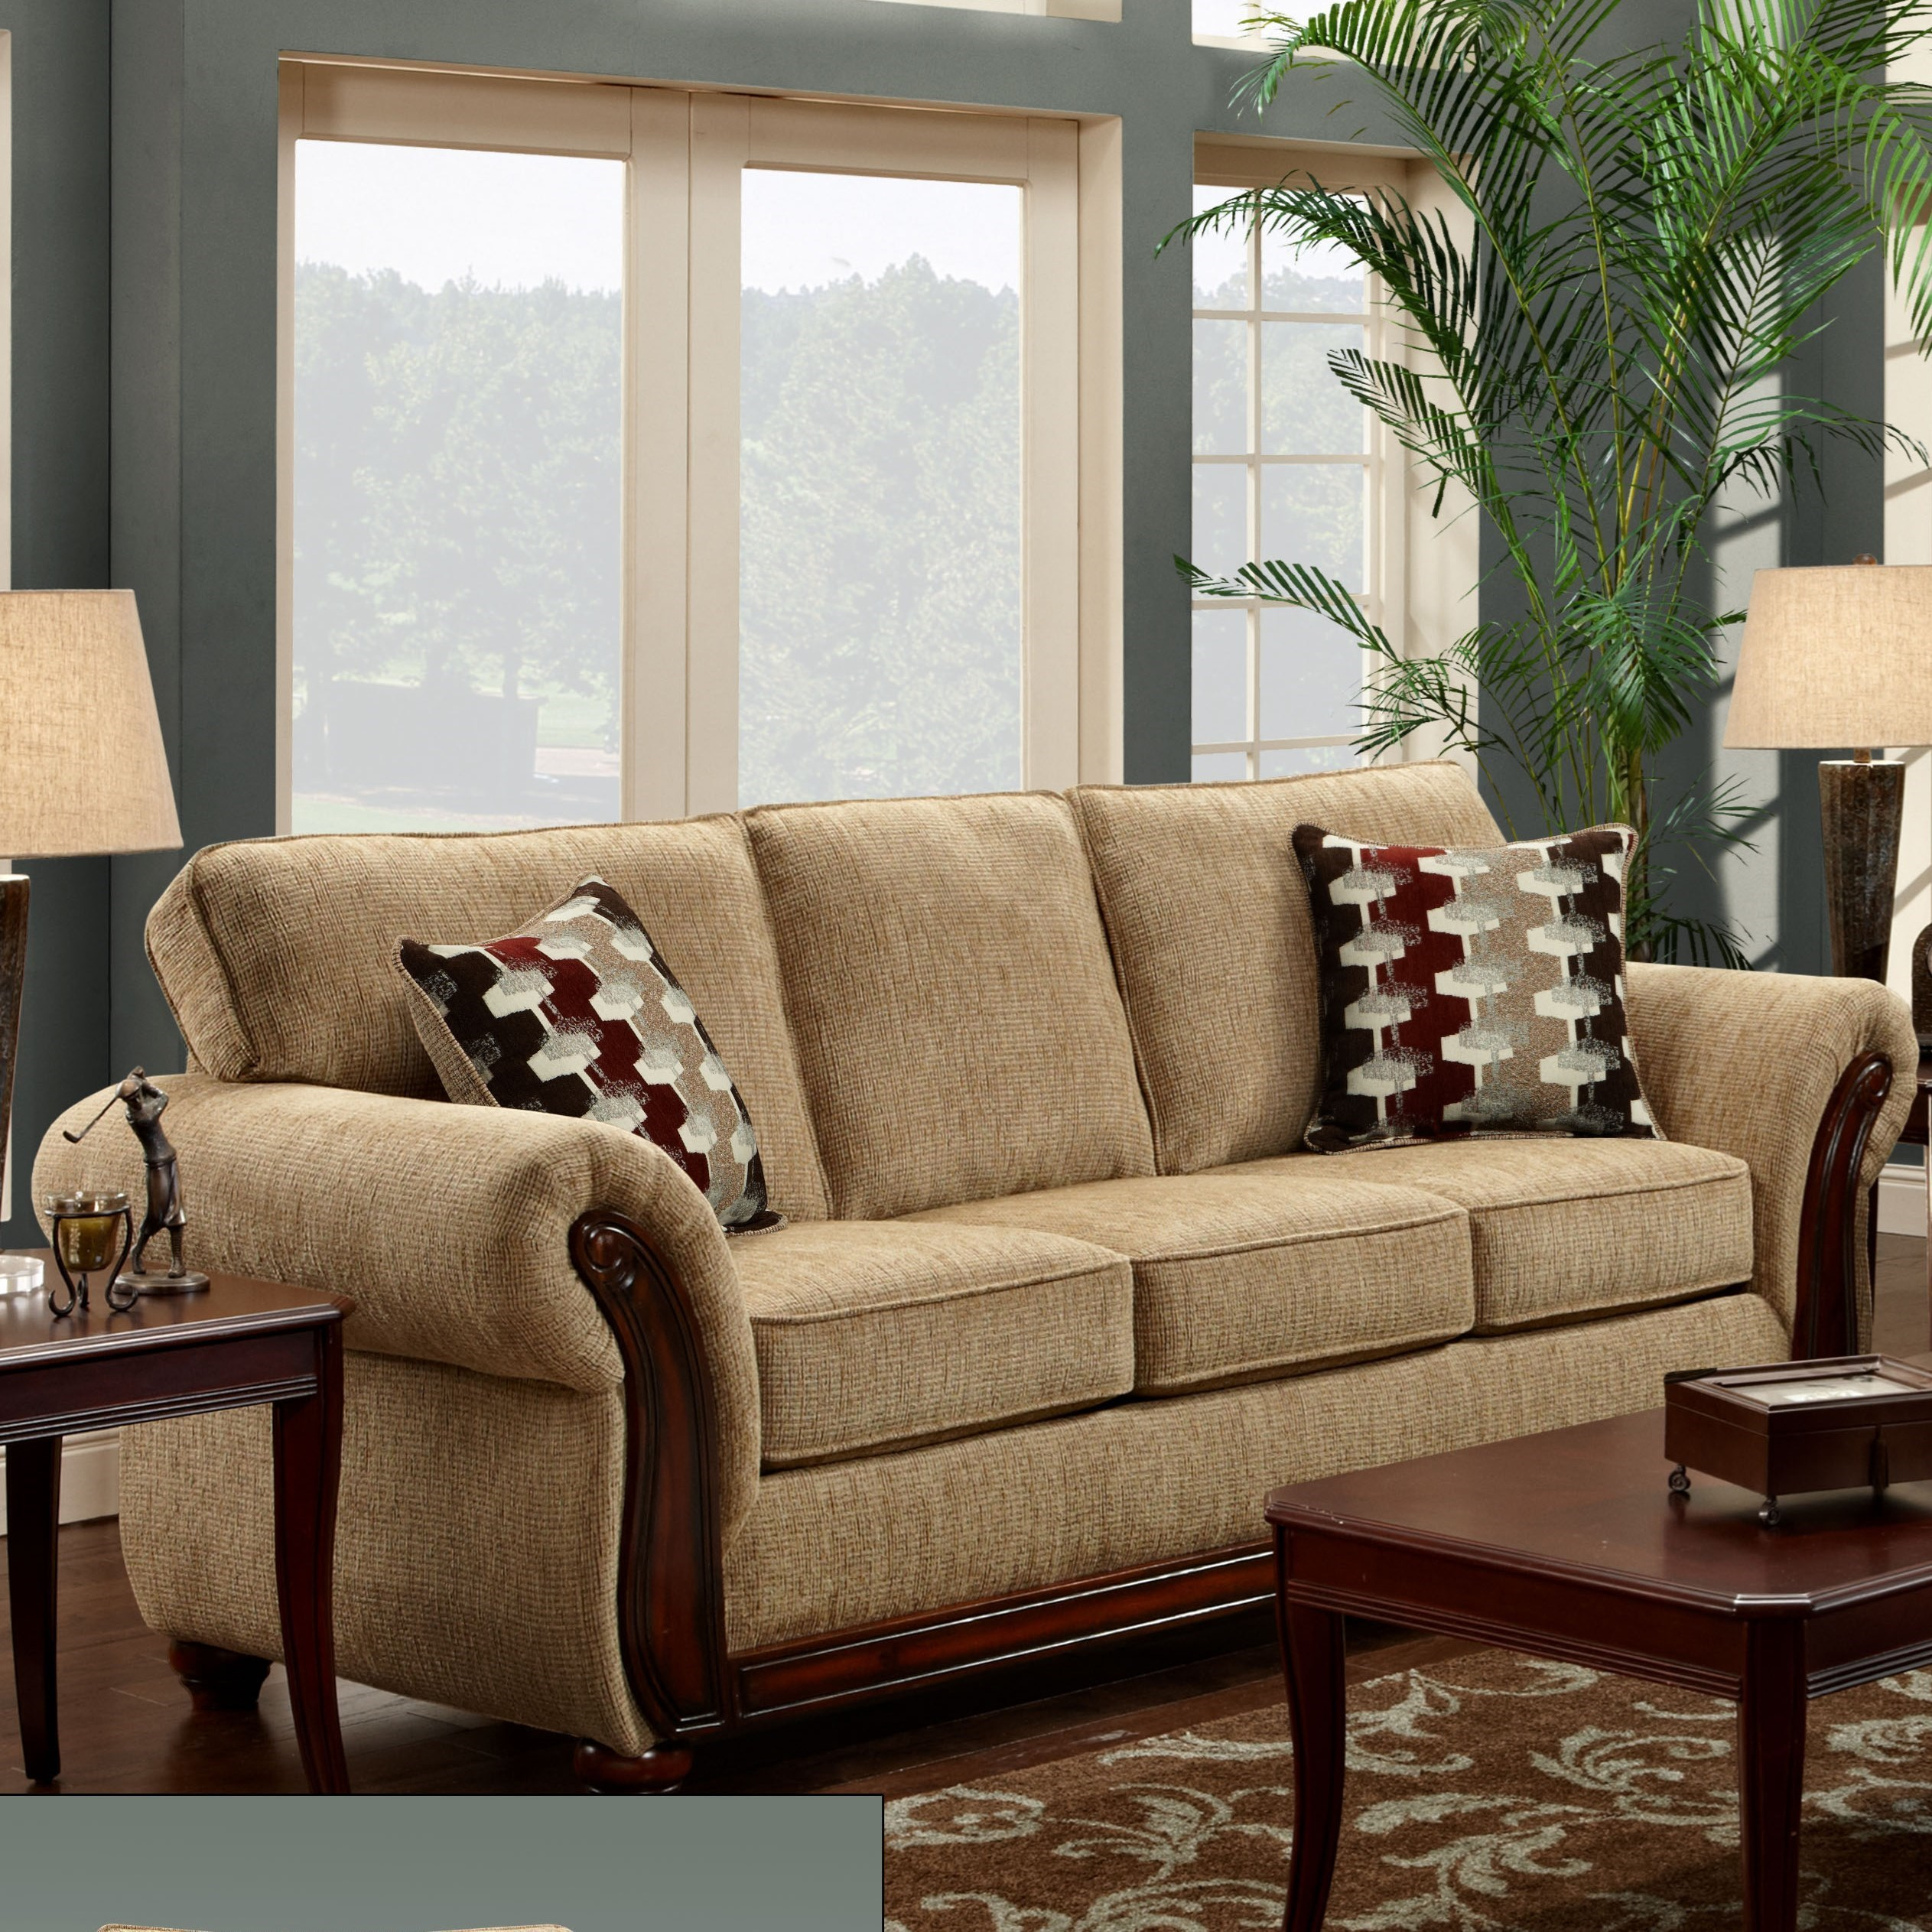 Washington Furniture 8100 Washington 8103 440 Traditional Sofa With Exposed Wood Arms Del Sol